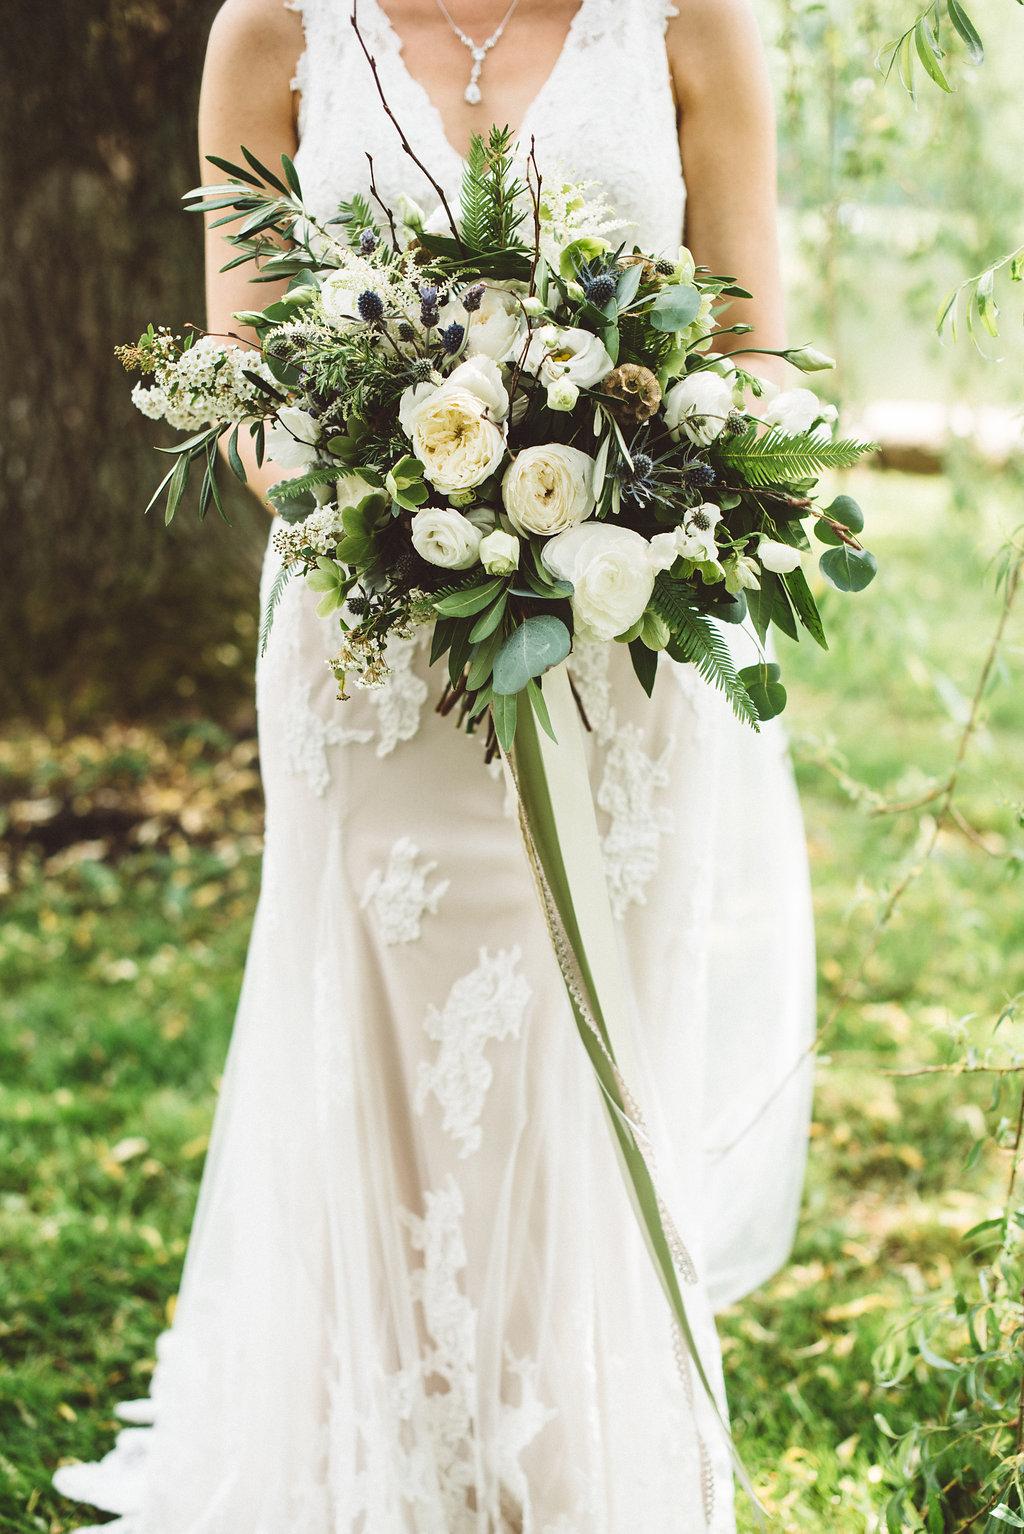 Photo: Suruzan Photography, Floral: Molly Taylor and Company